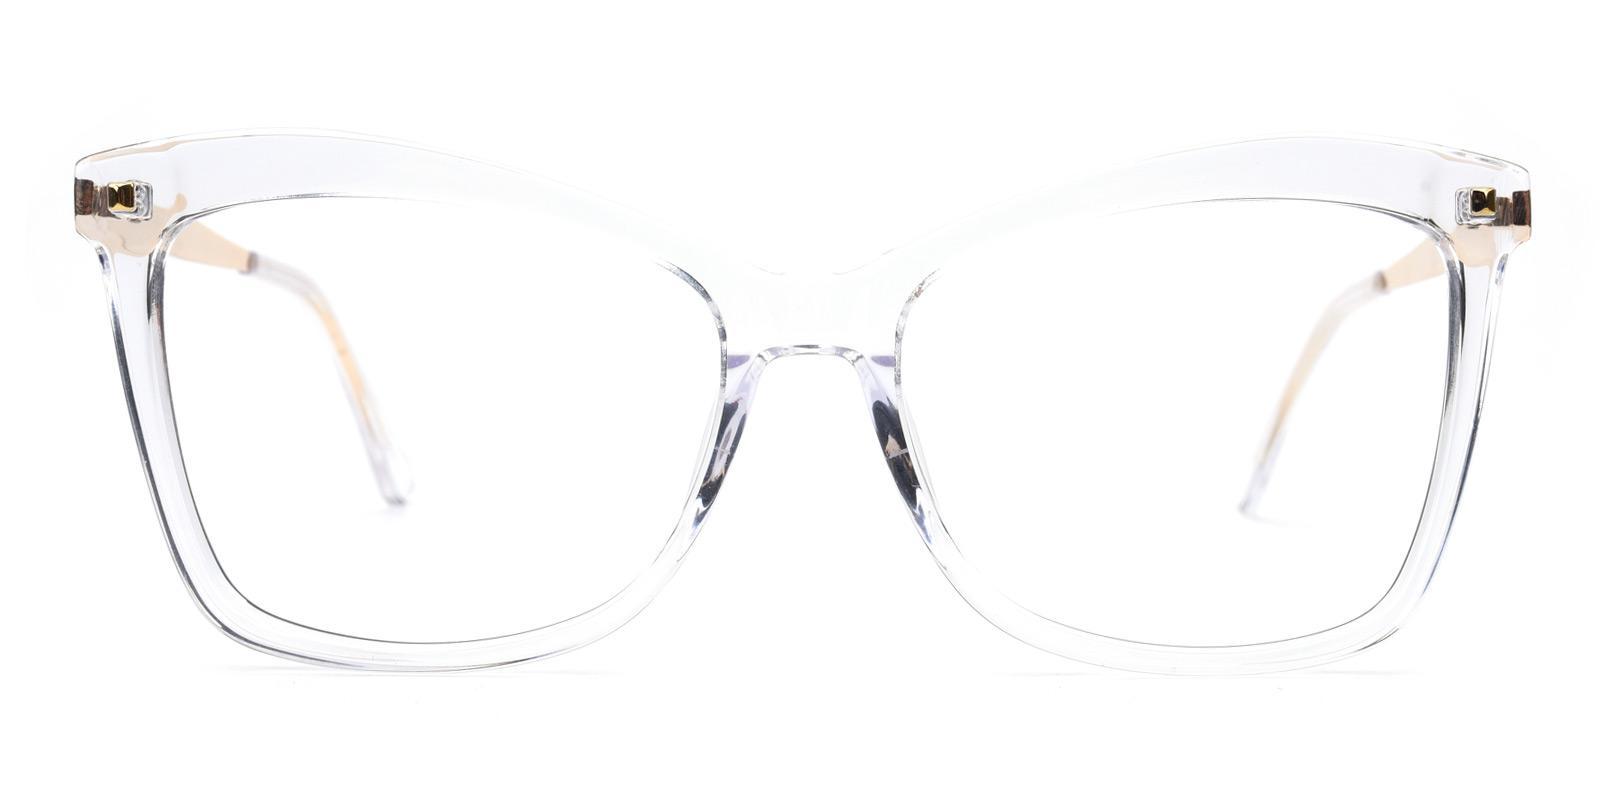 Gleen-Translucent-Cat-Combination-Eyeglasses-additional2